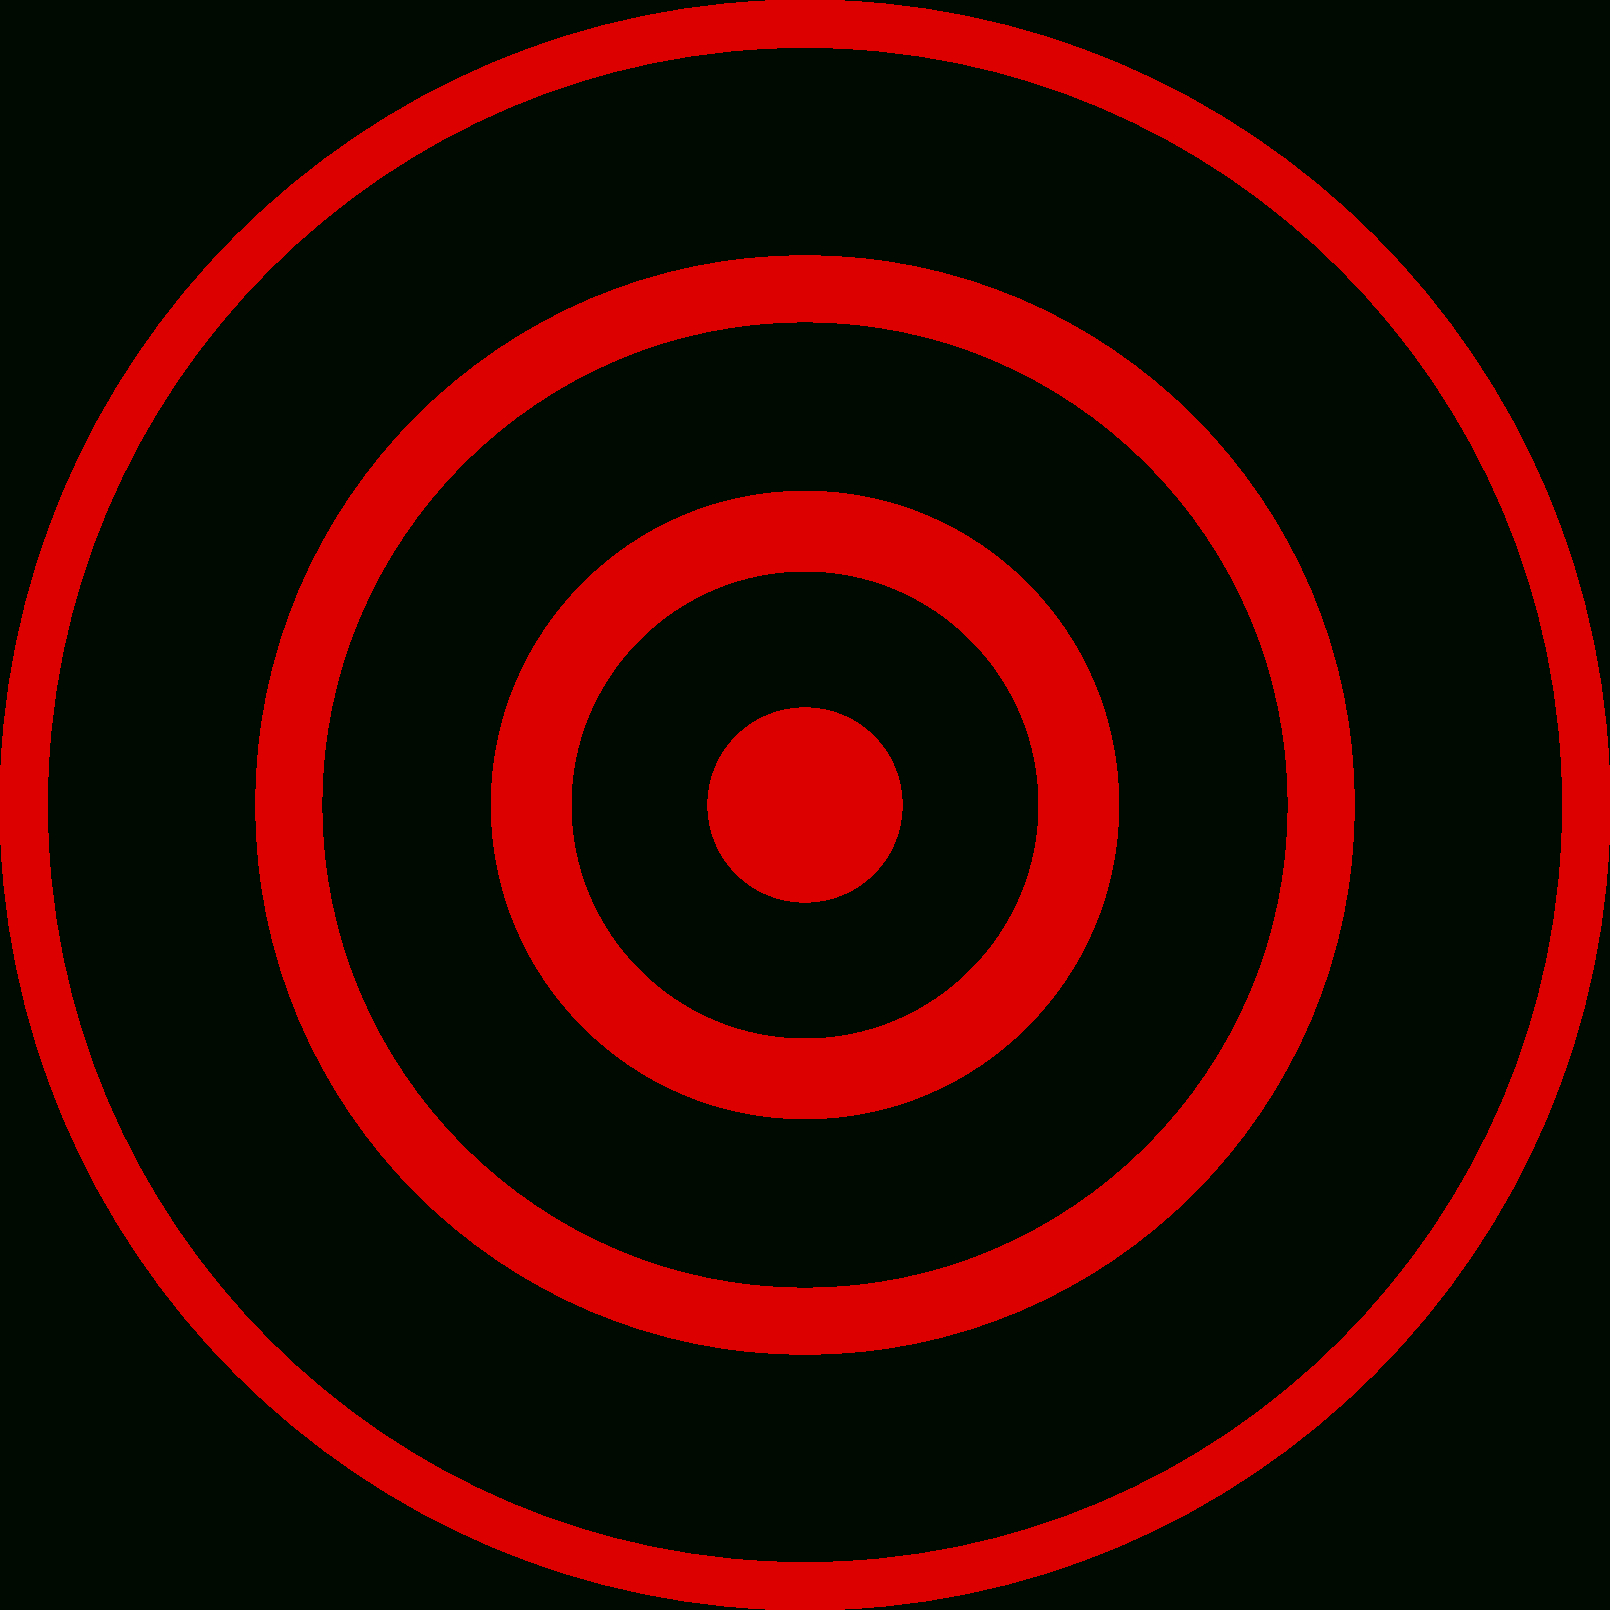 Free Bullseye Images, Download Free Clip Art, Free Clip Art On - Free Printable Bullseye